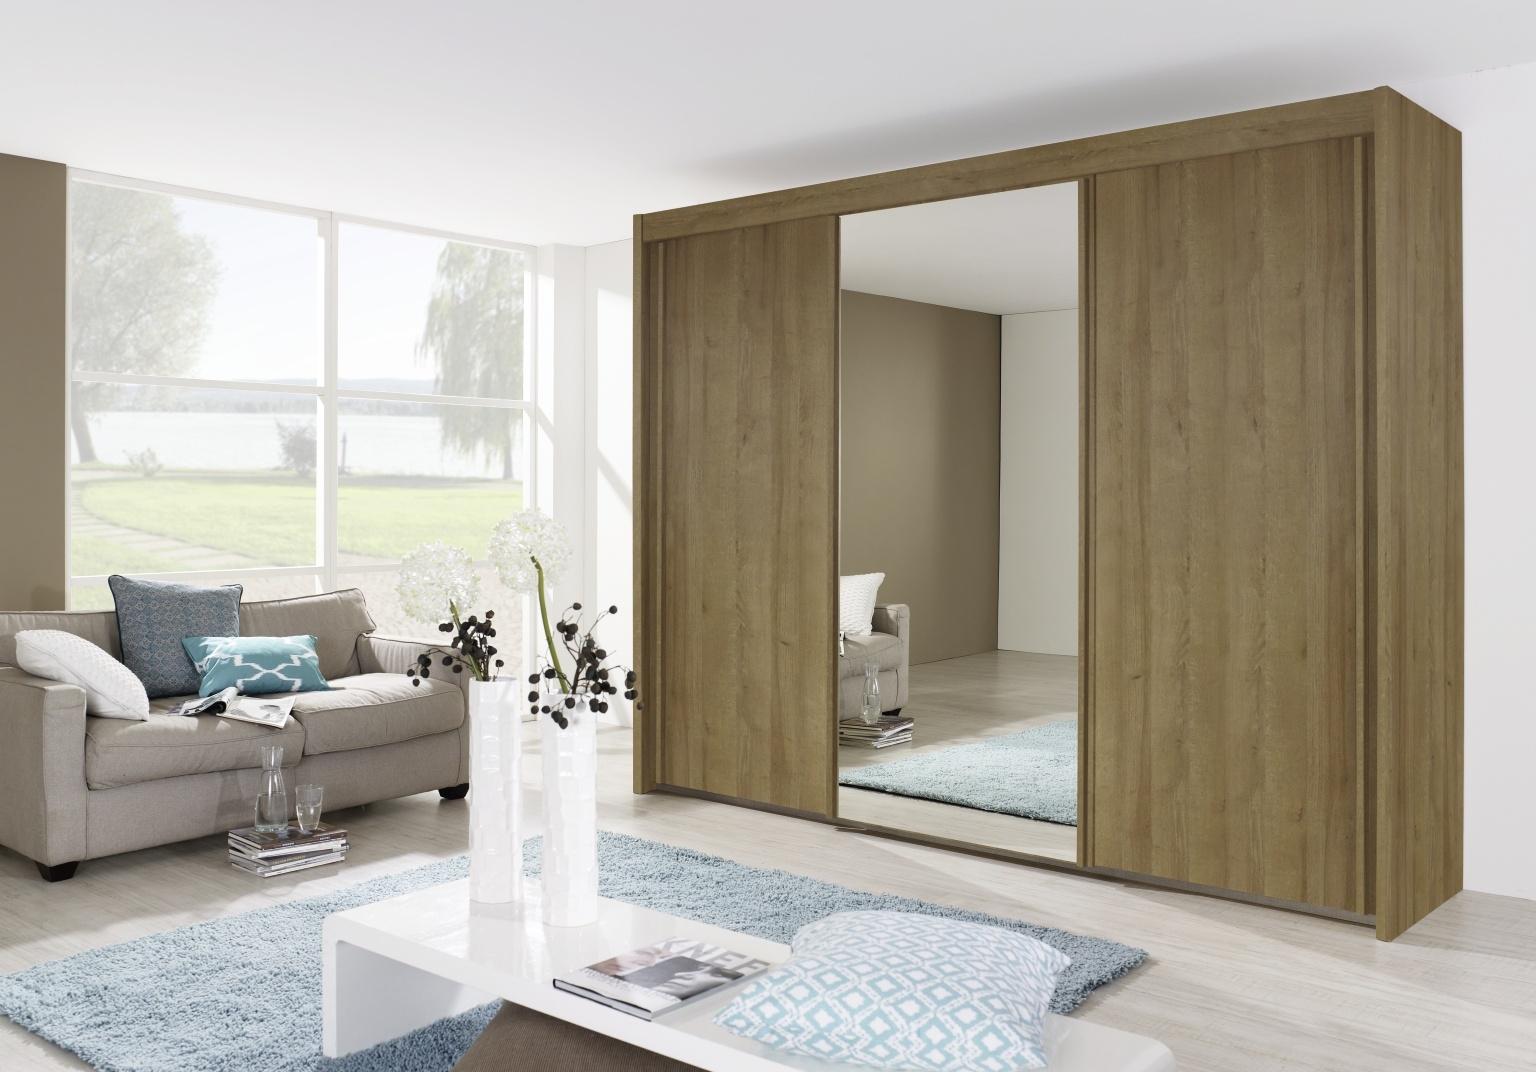 Rauch Imperial Rivera Oak 3 Door Sliding Wardrobe with 1 Mirror W 225cm